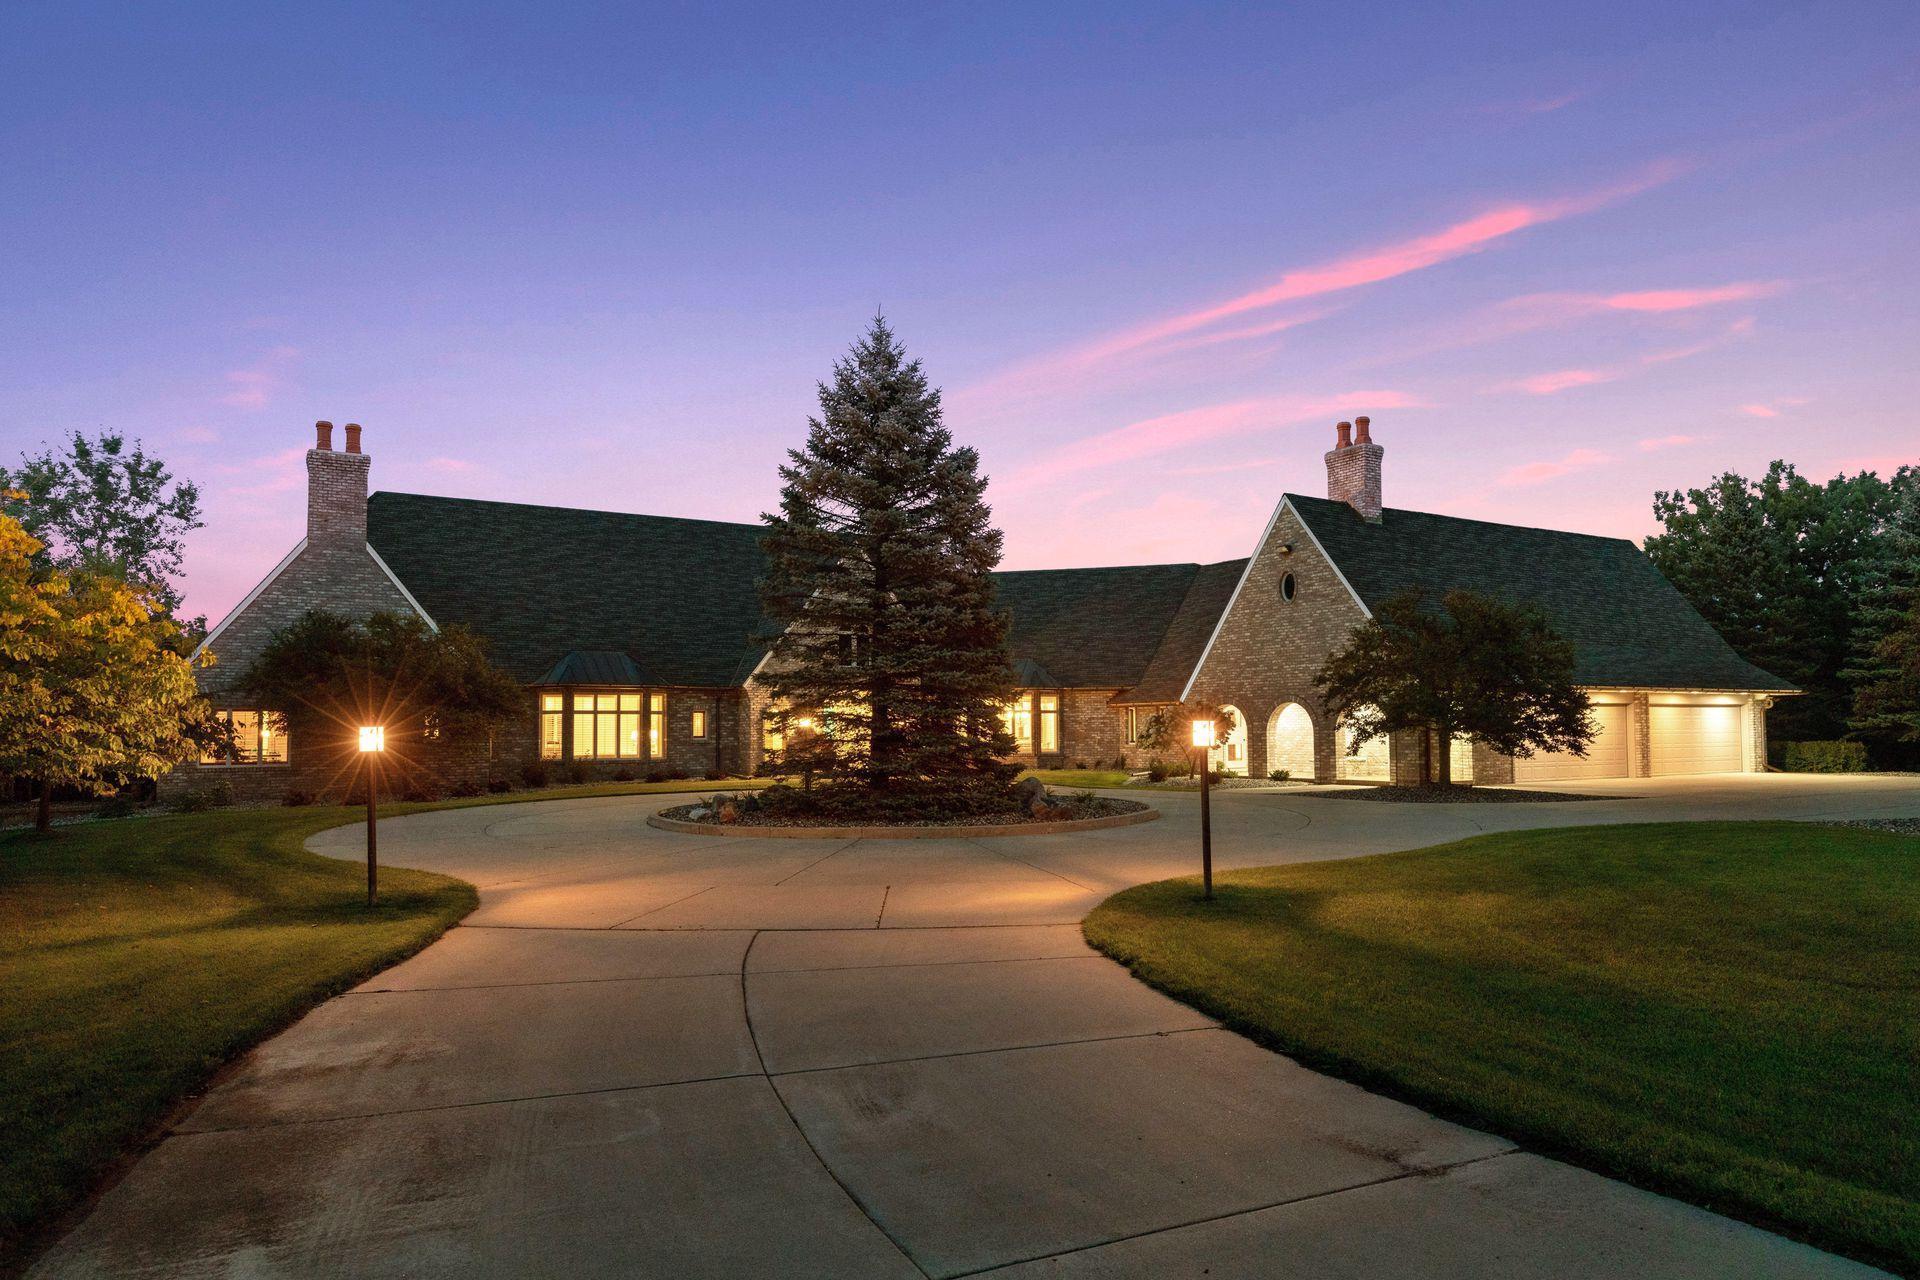 12151 Danbury Way Property Photo - Rosemount, MN real estate listing